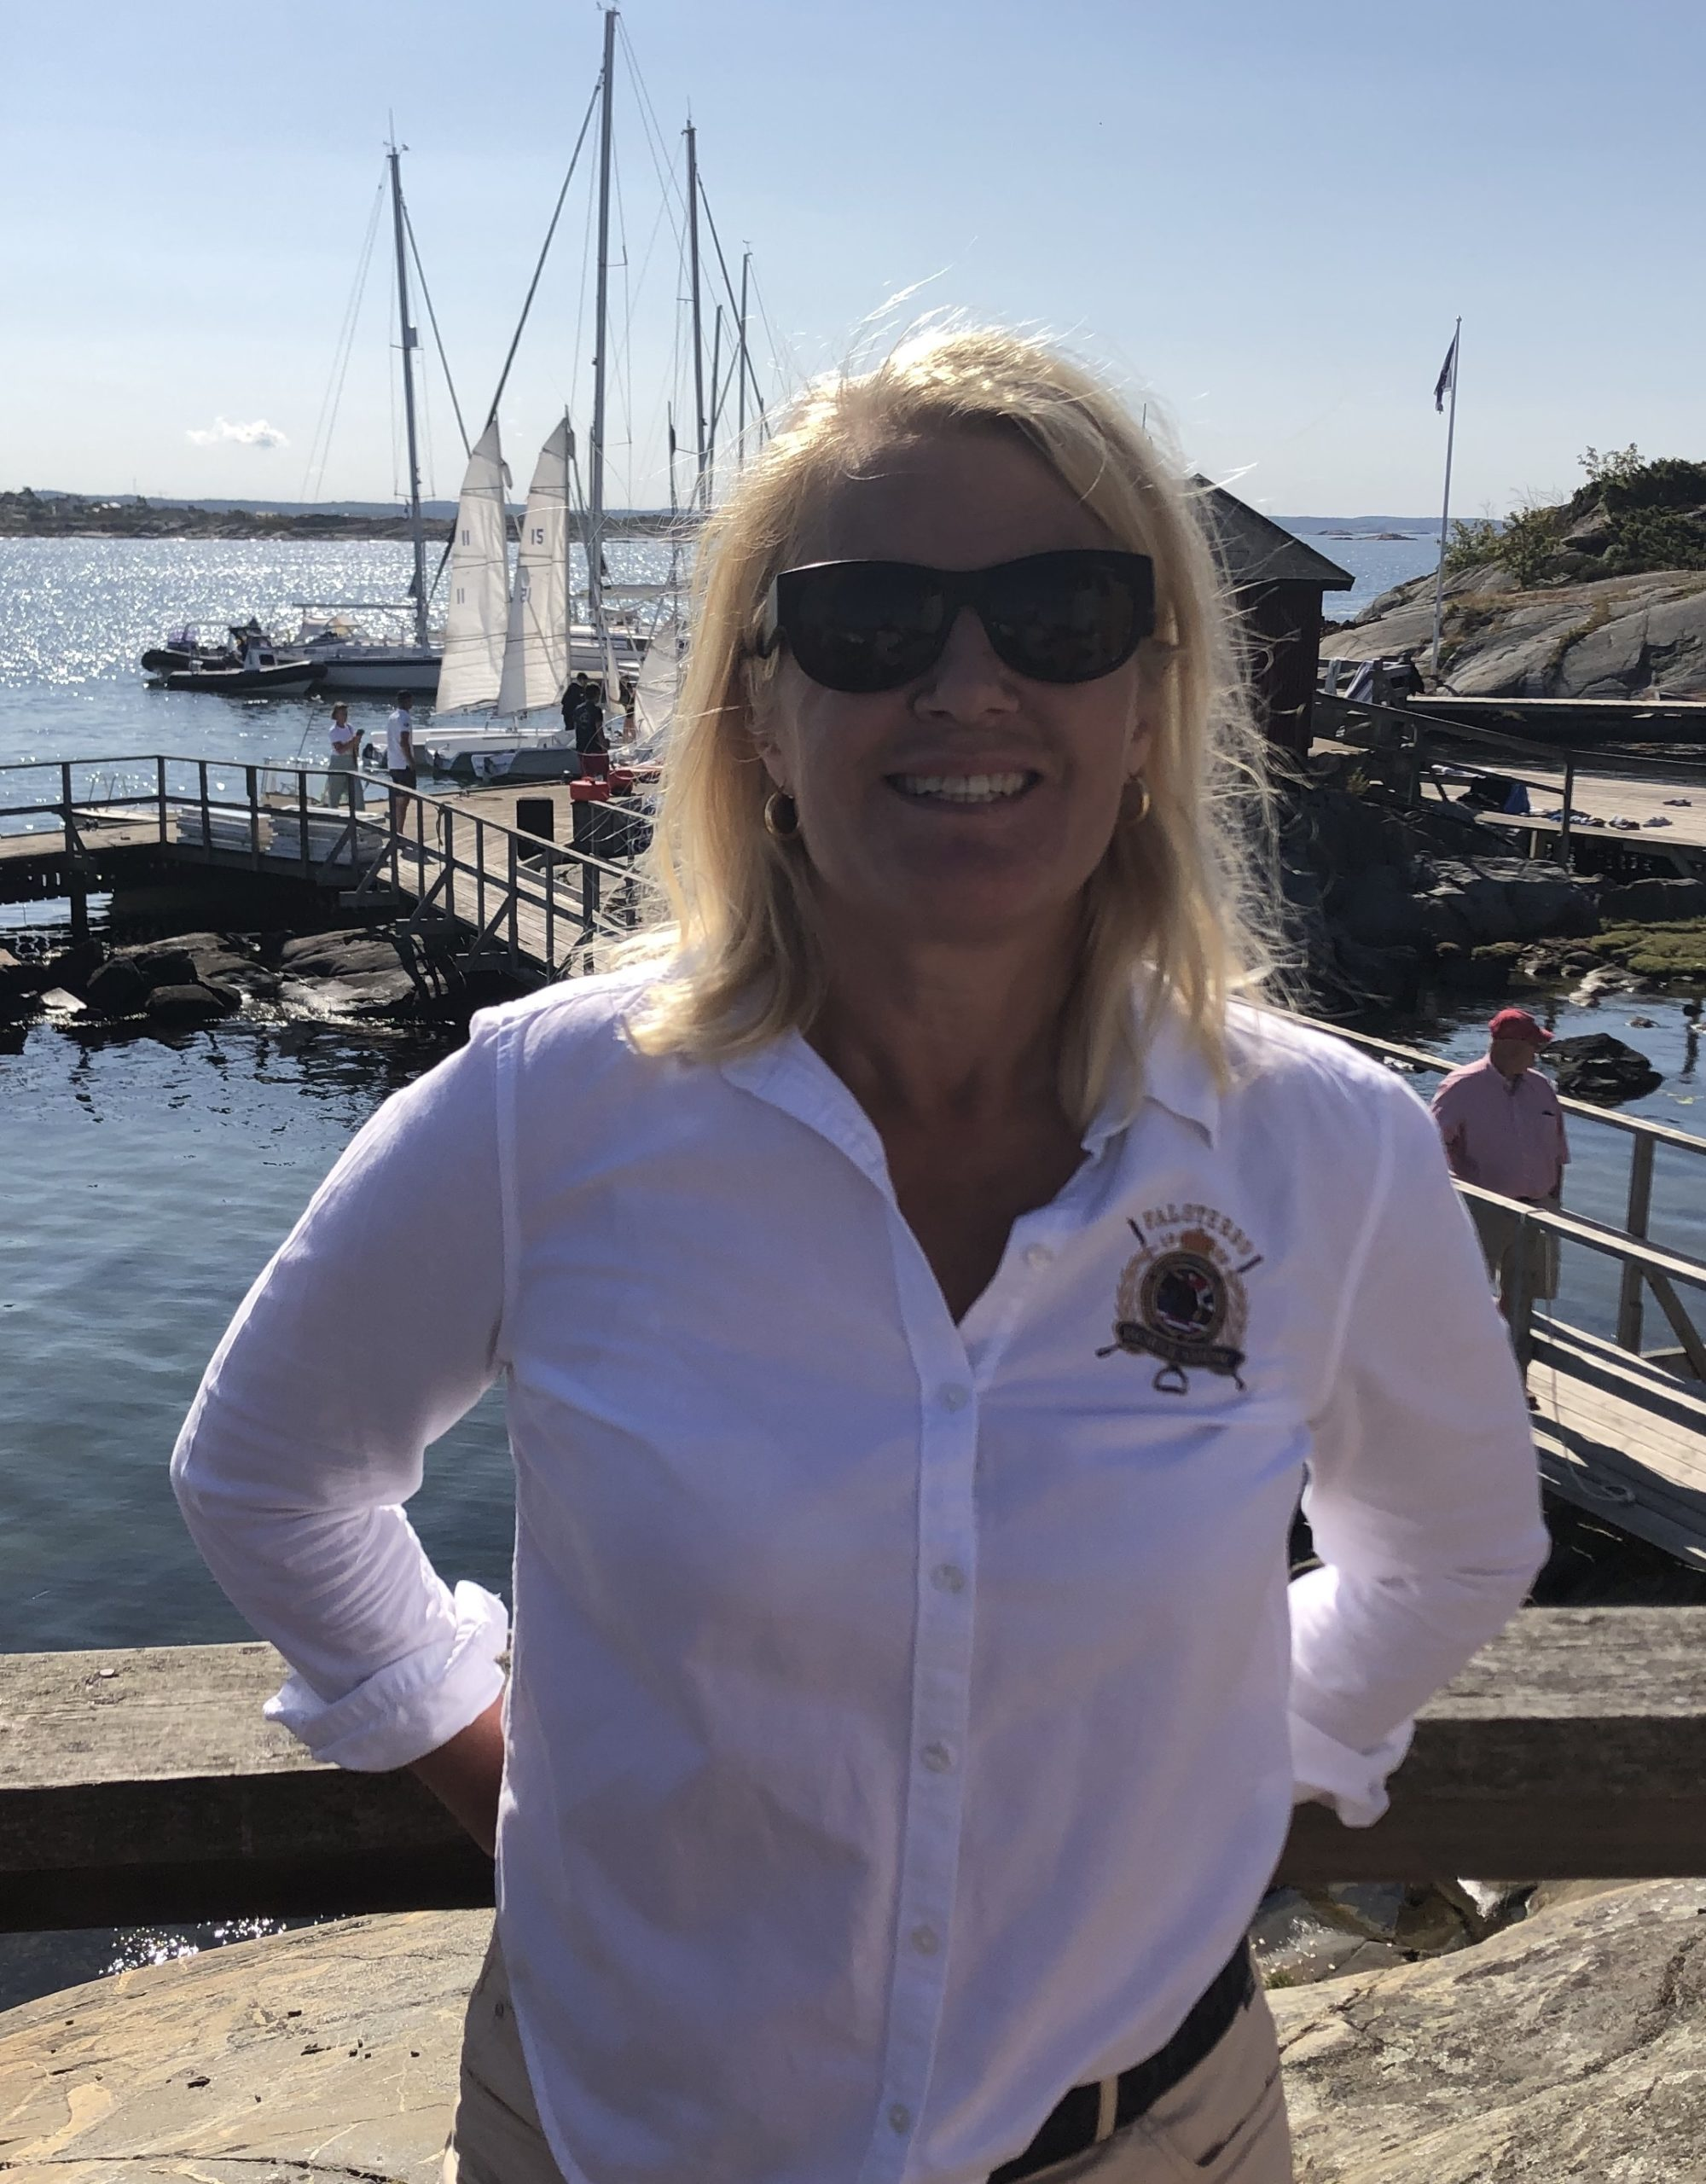 Välkommen Marianne Lilja Wittbom som ny ledamot i Utrikeshandelsföreningens styrelse